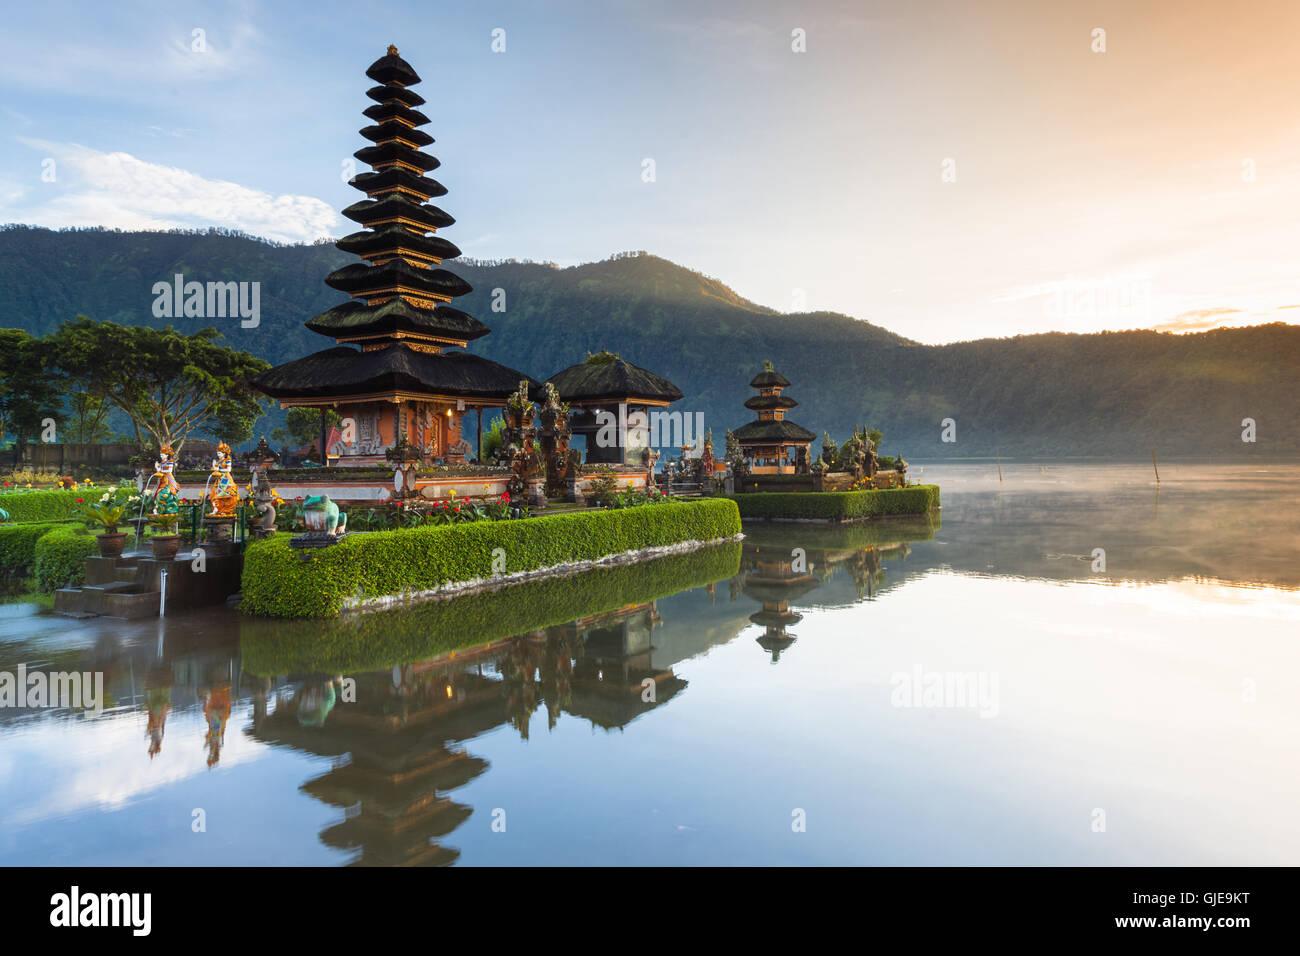 Pura Ulun Danu Bratan al amanecer, famoso templo sobre el lago Bedugul, Bali, Indonesia. Imagen De Stock